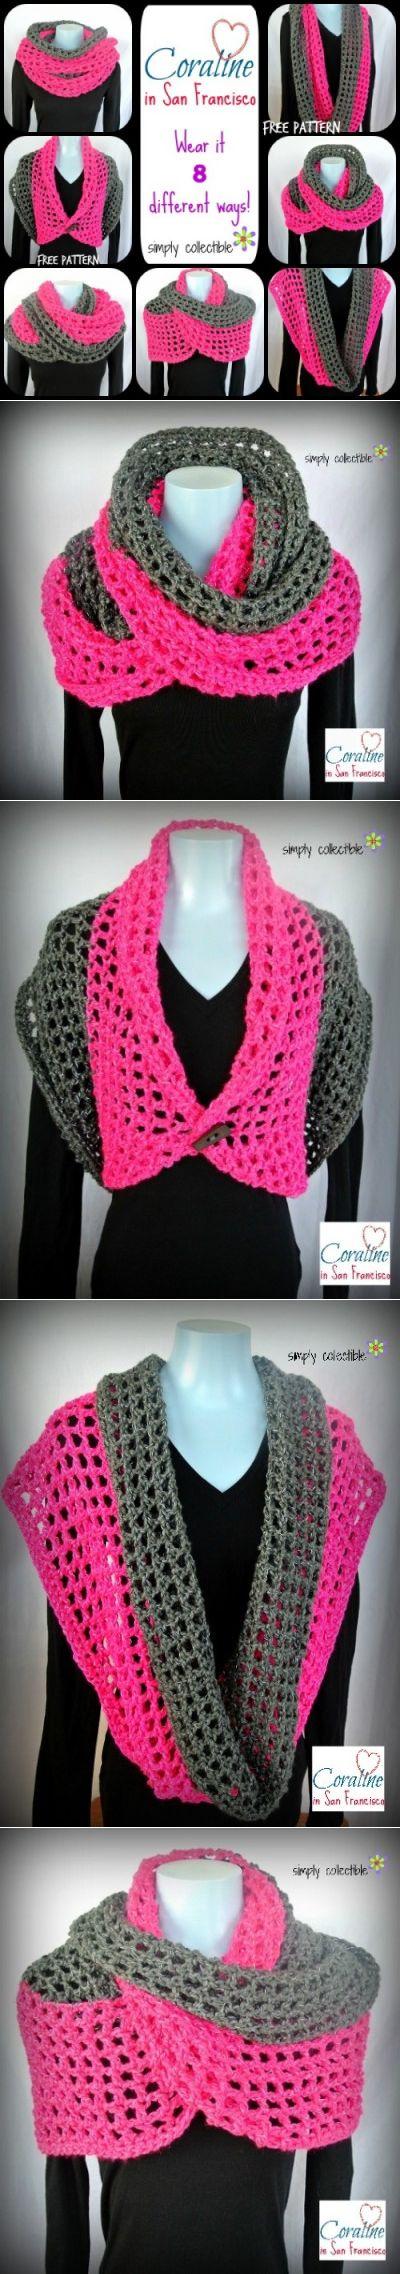 457 besten knitting & crochet Bilder auf Pinterest   Häkelprojekte ...